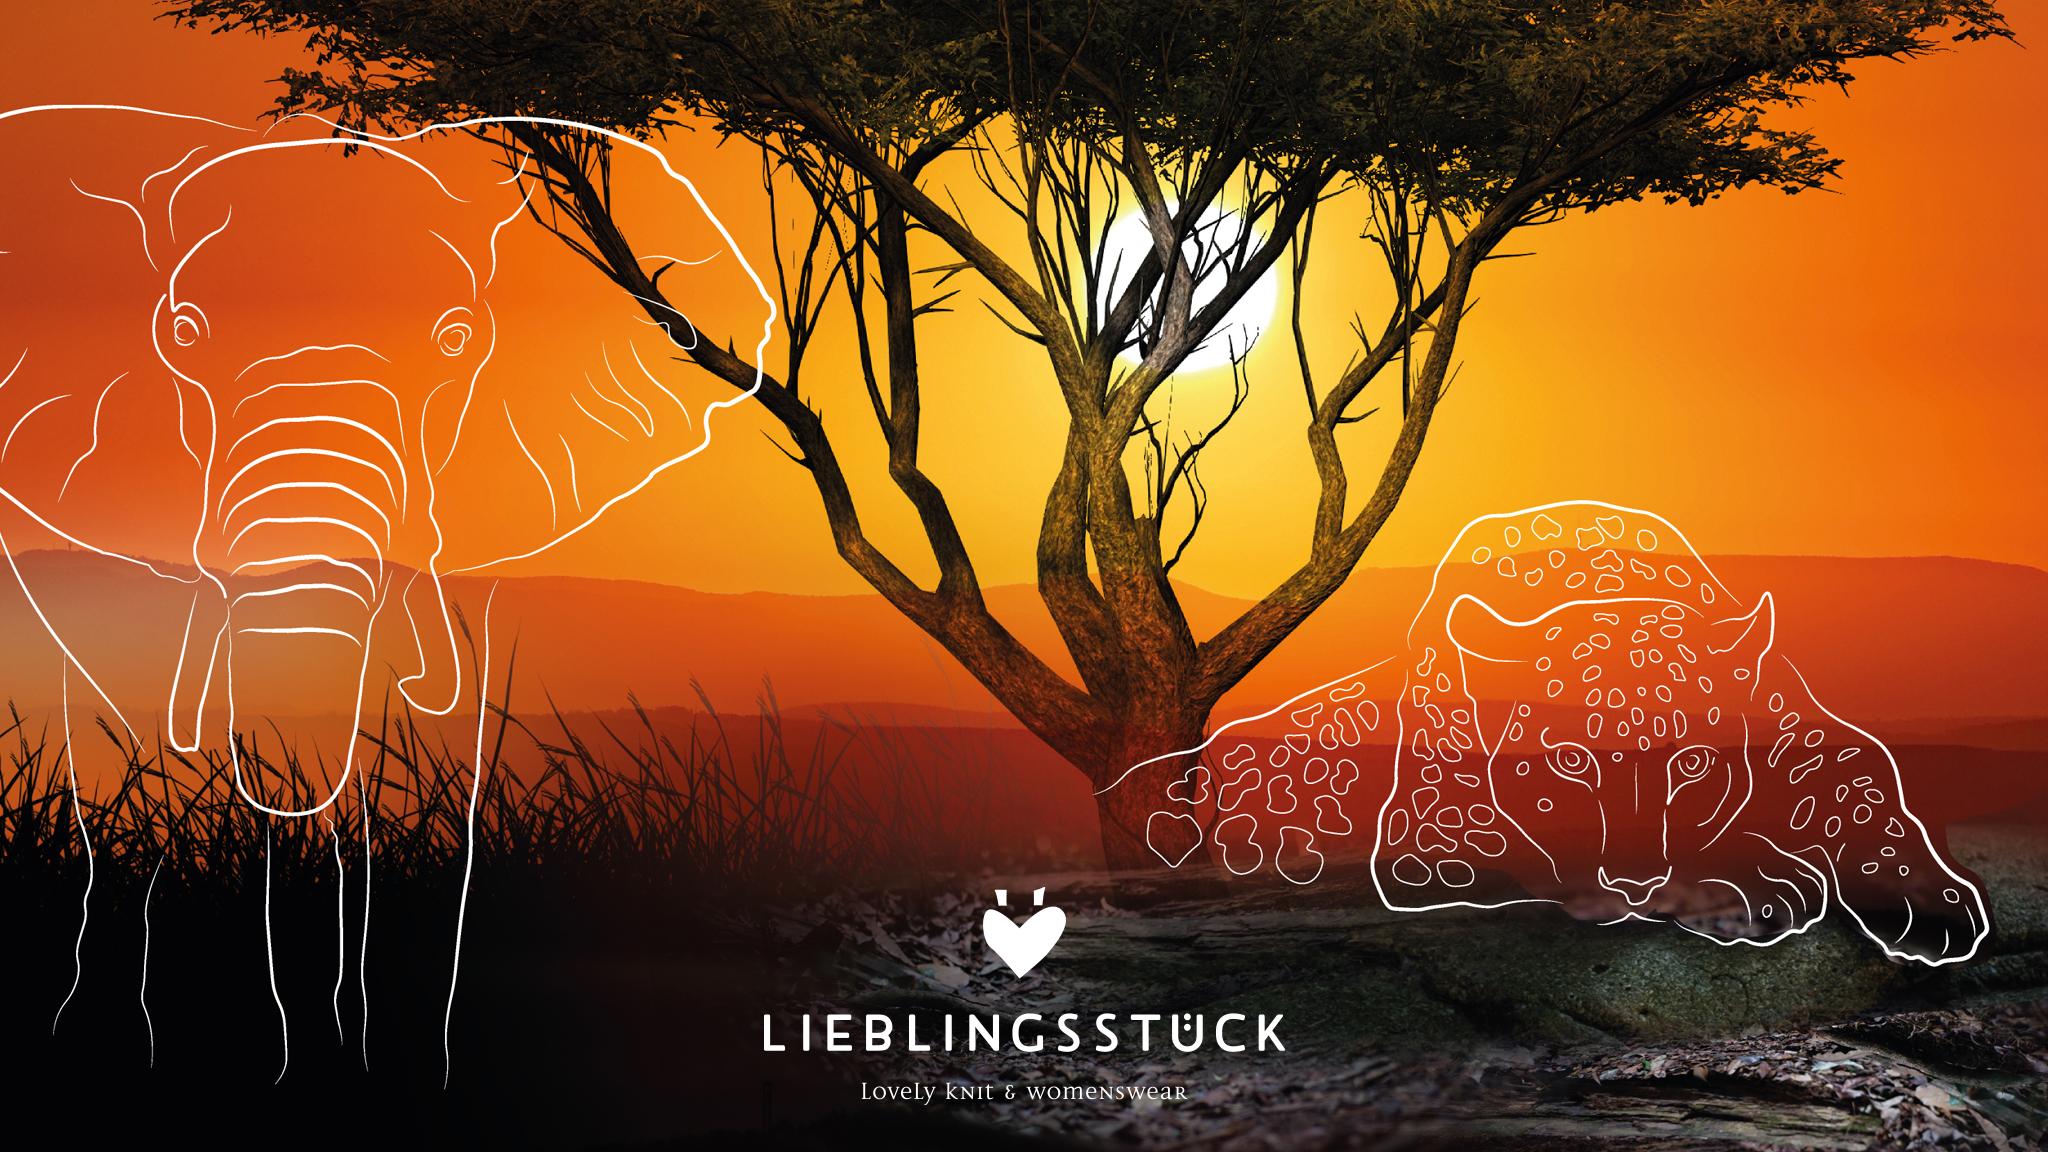 Lieblingsstueck Leffers Oldenburg Pop-Up-Store